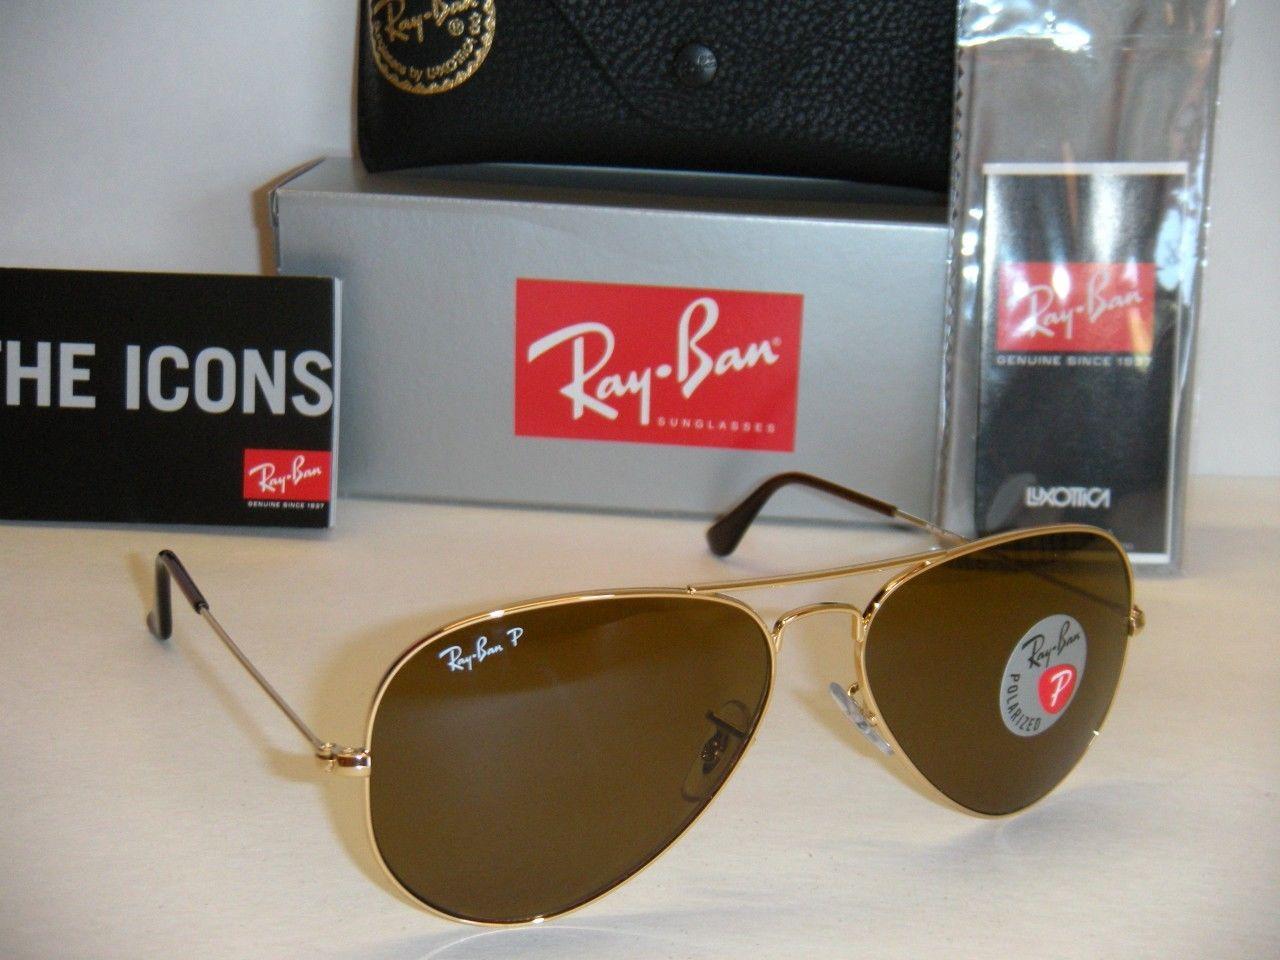 Ray Ban AVIATOR RB3025 001/57 Polarized 58mm